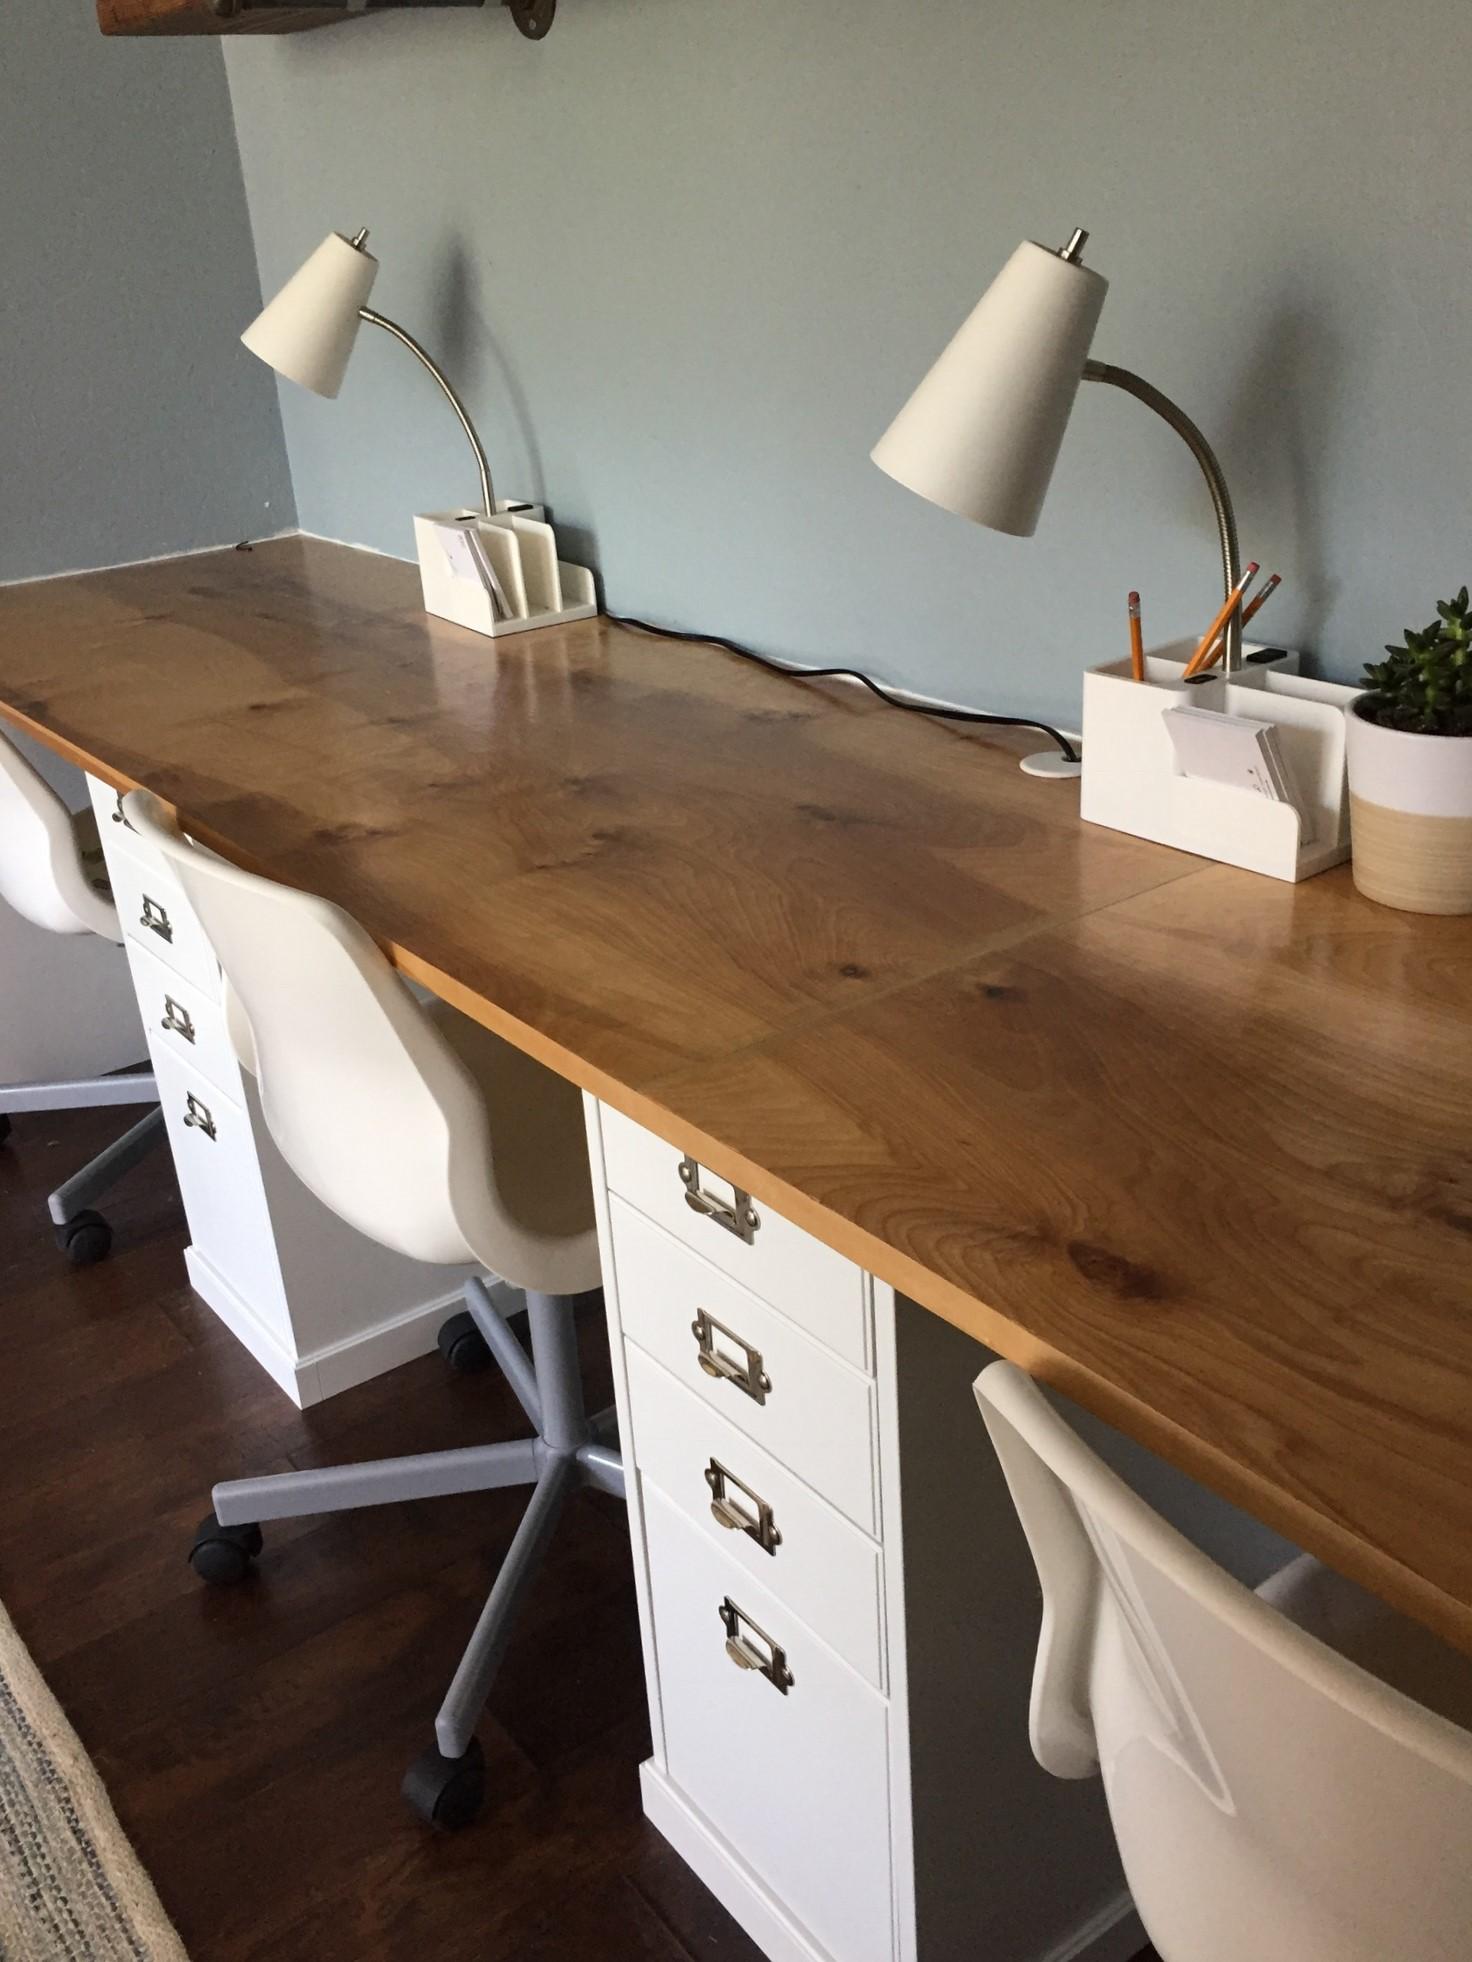 DIY Built in Desk